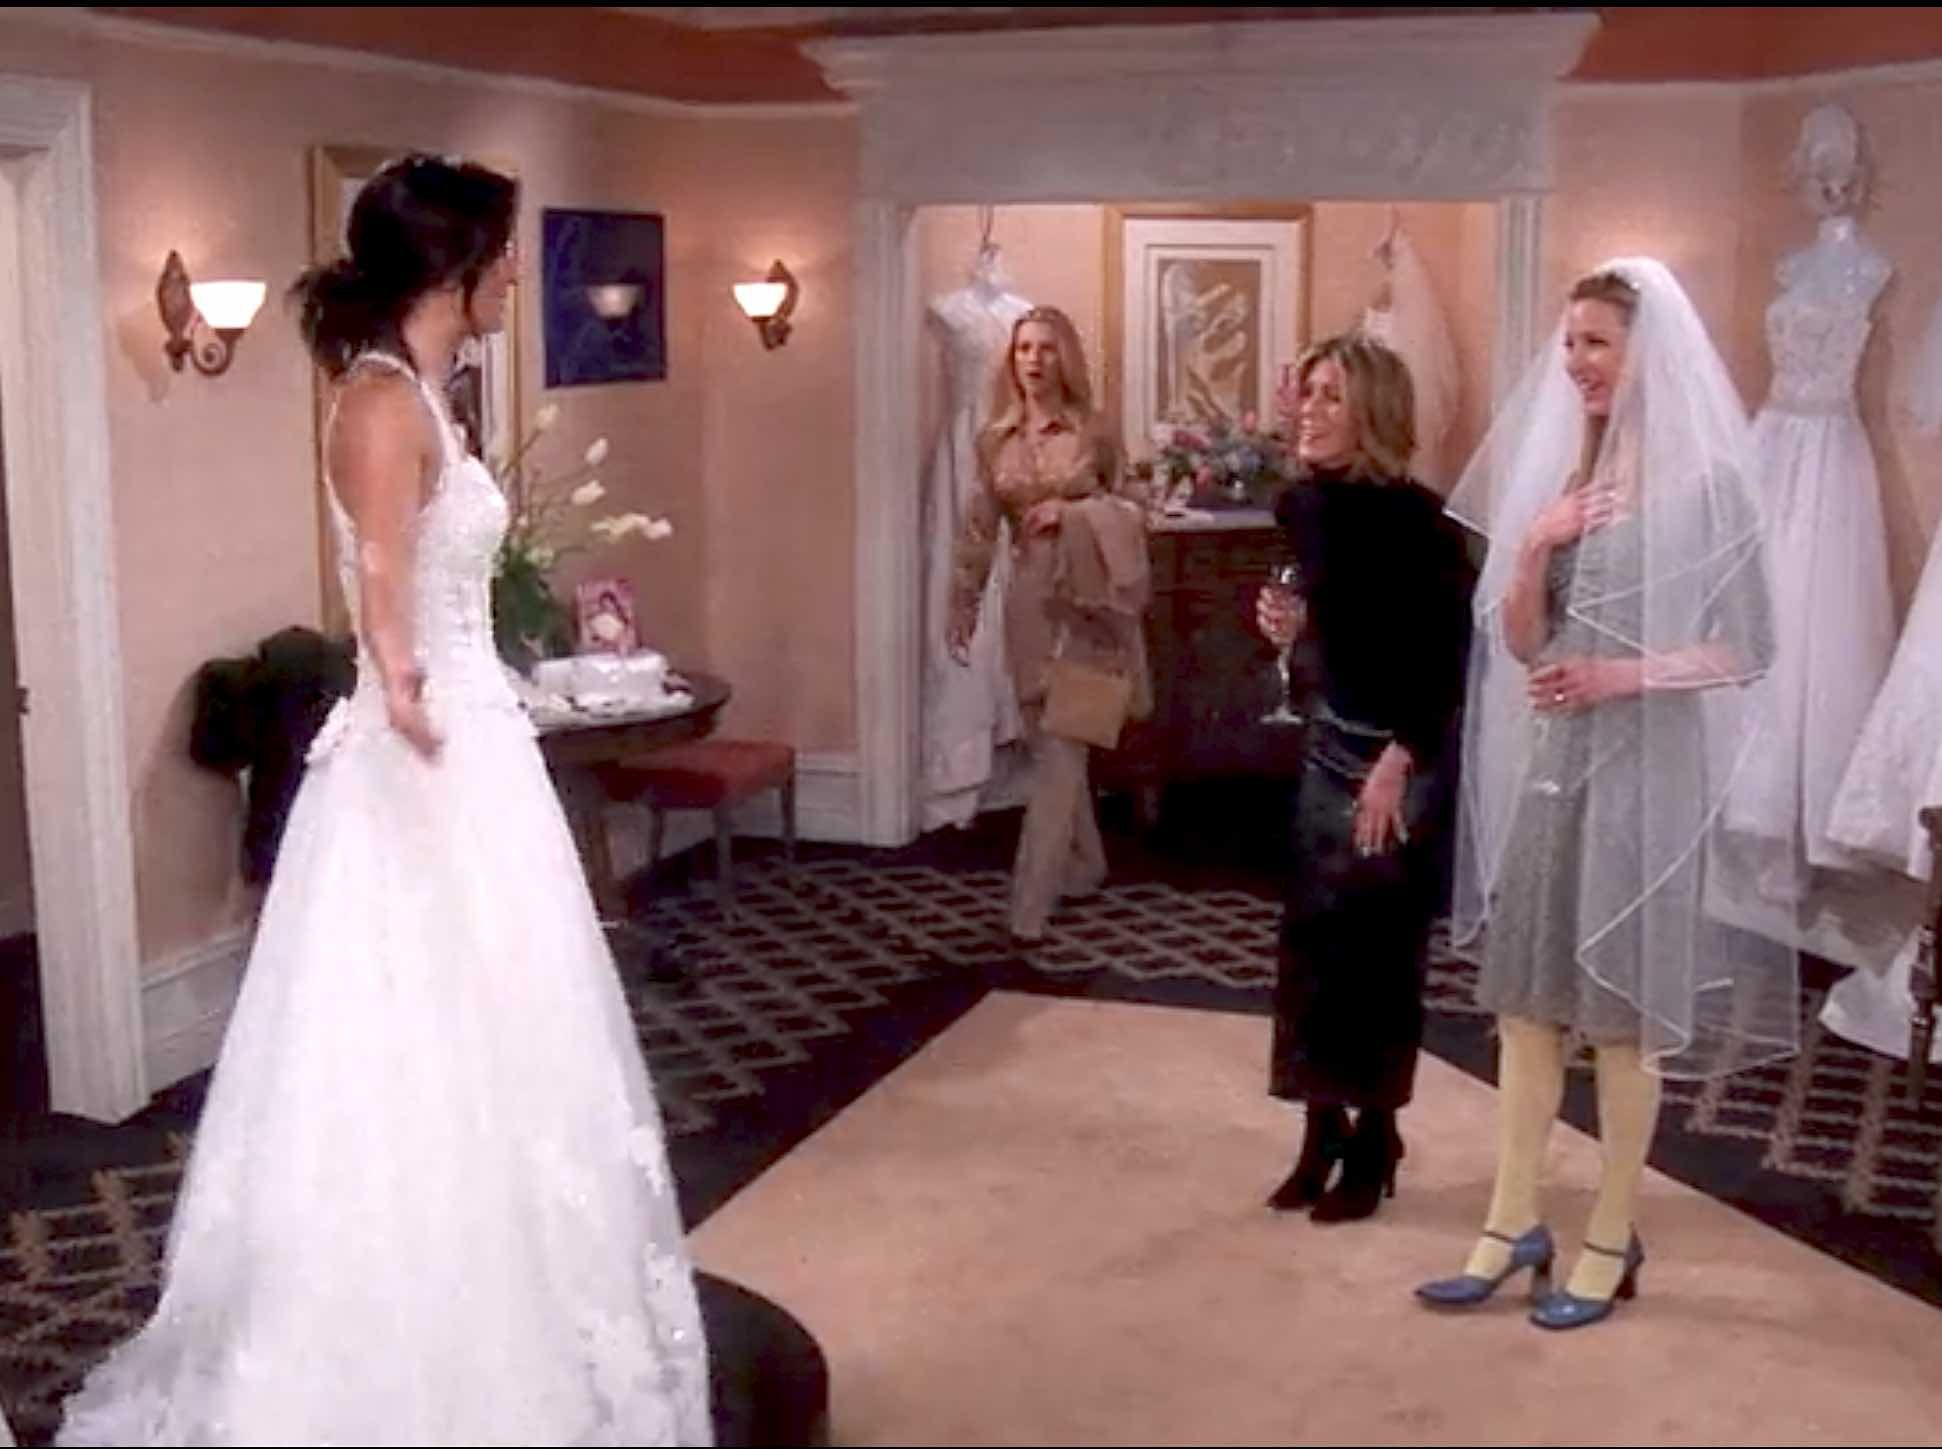 656 Outfits Phoebe Buffay Wore On Friends Fashion Paradoxes Phoebe Buffay Outfits Rachel Green Outfits Friends Fashion [ 1449 x 1942 Pixel ]